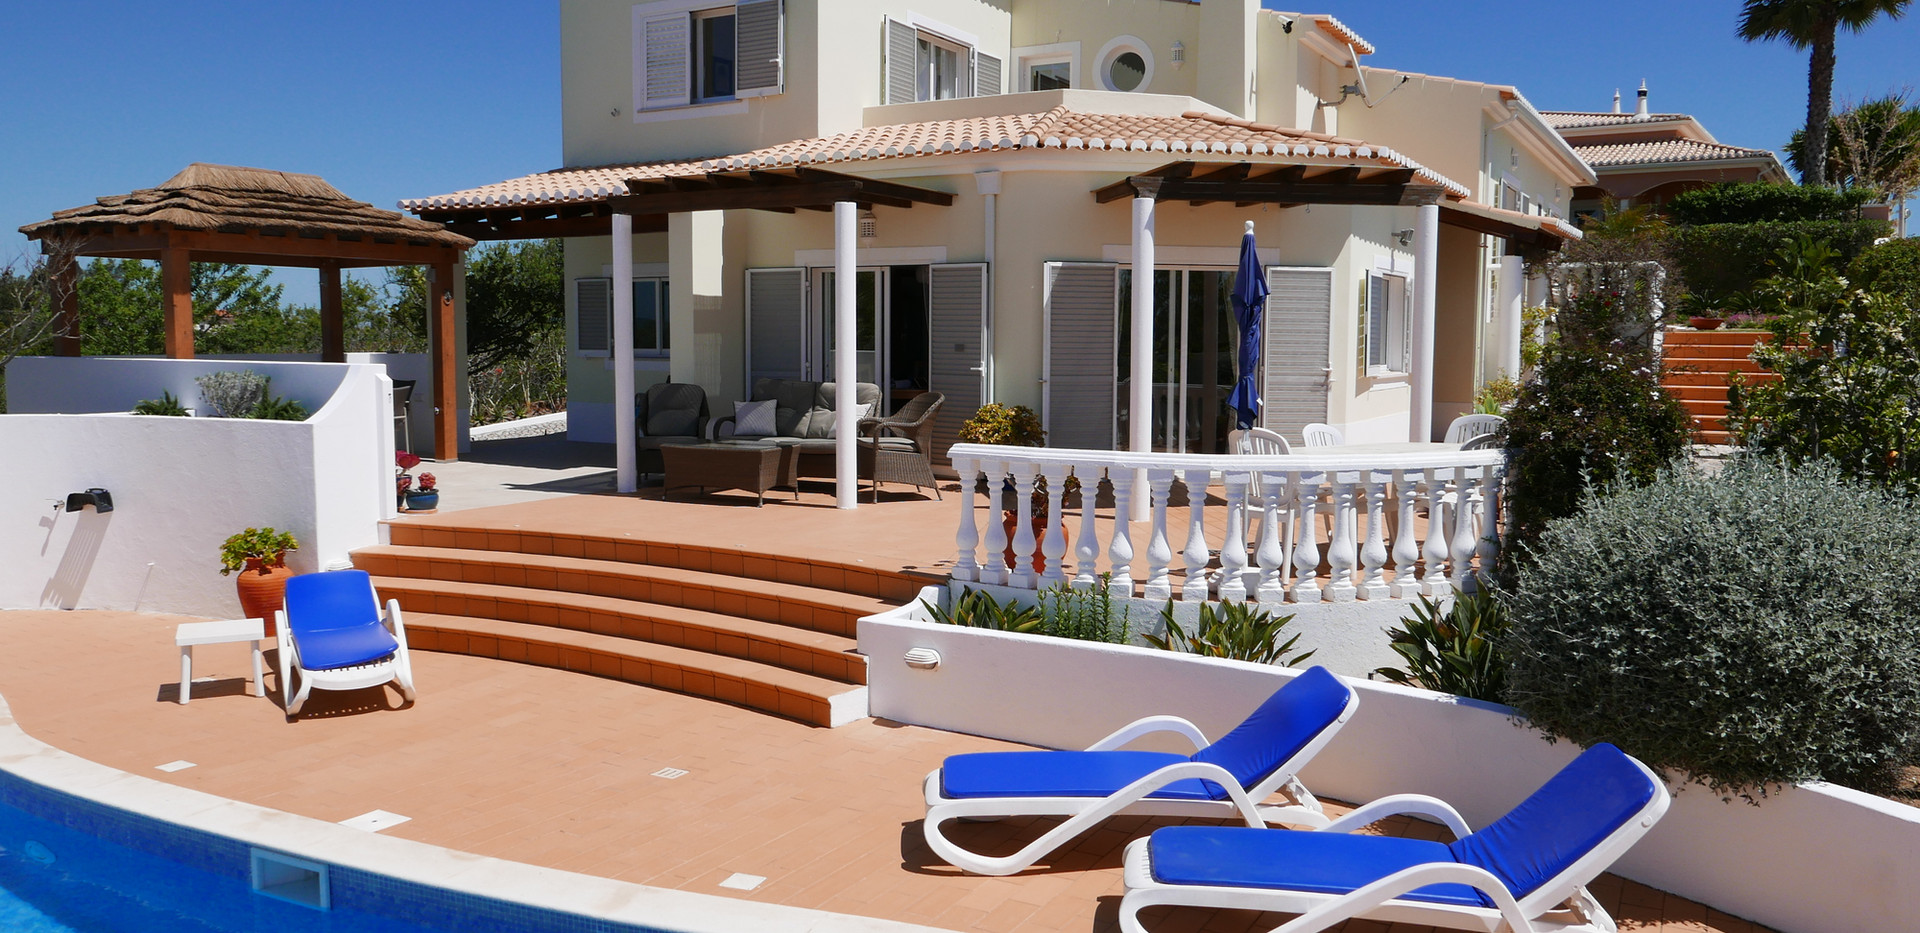 Villa pool 03.JPG